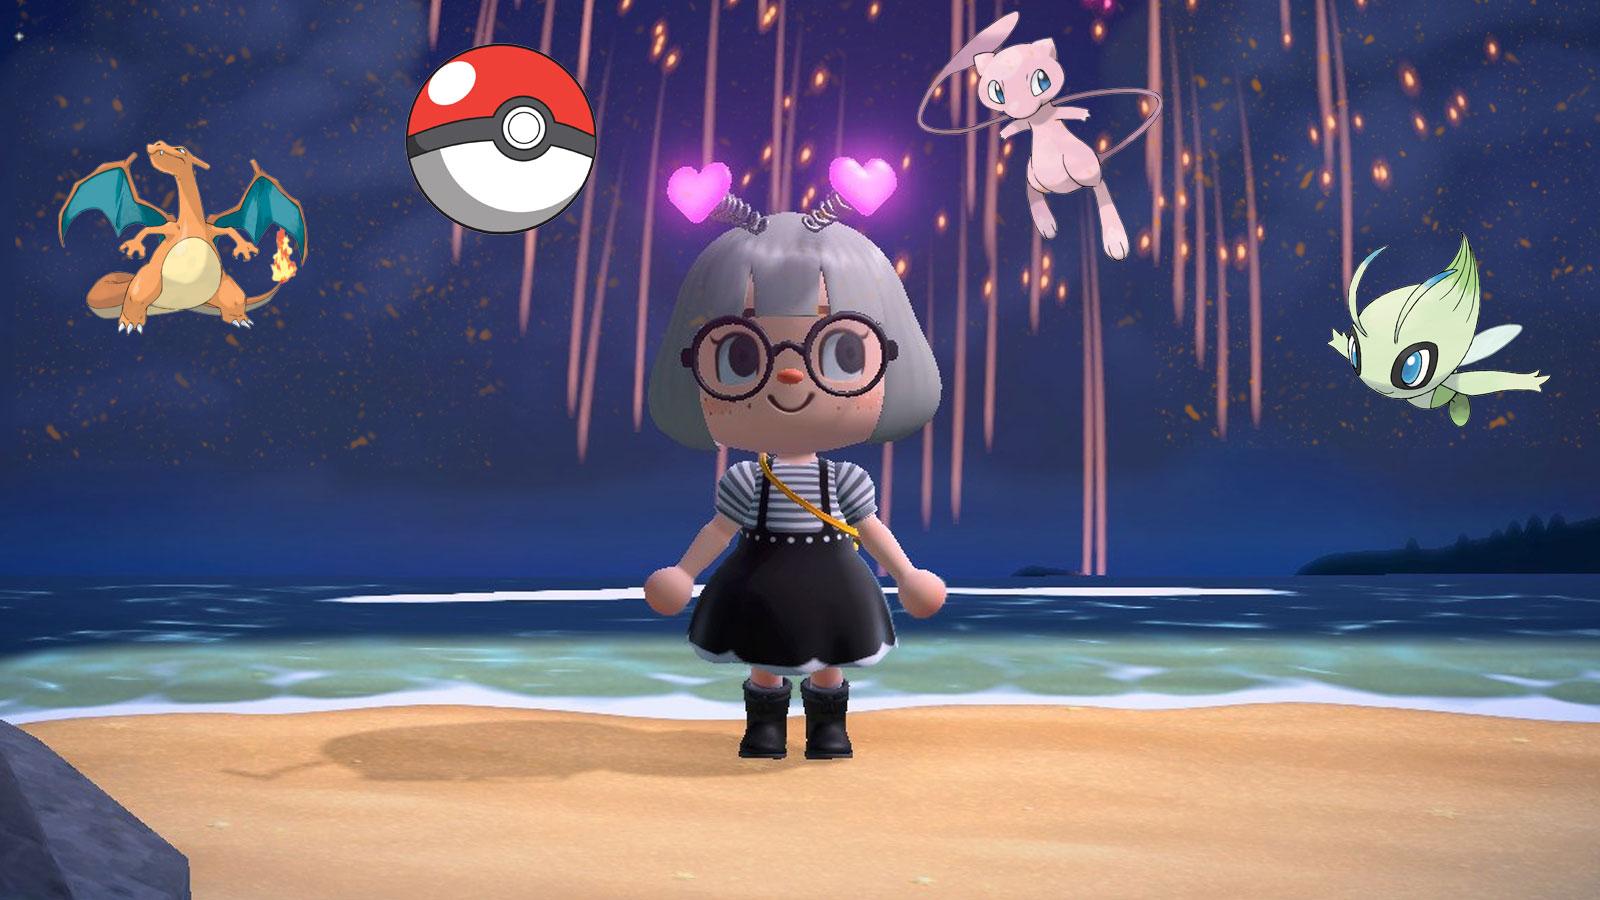 animal crossing new horizons pokemon fireworks